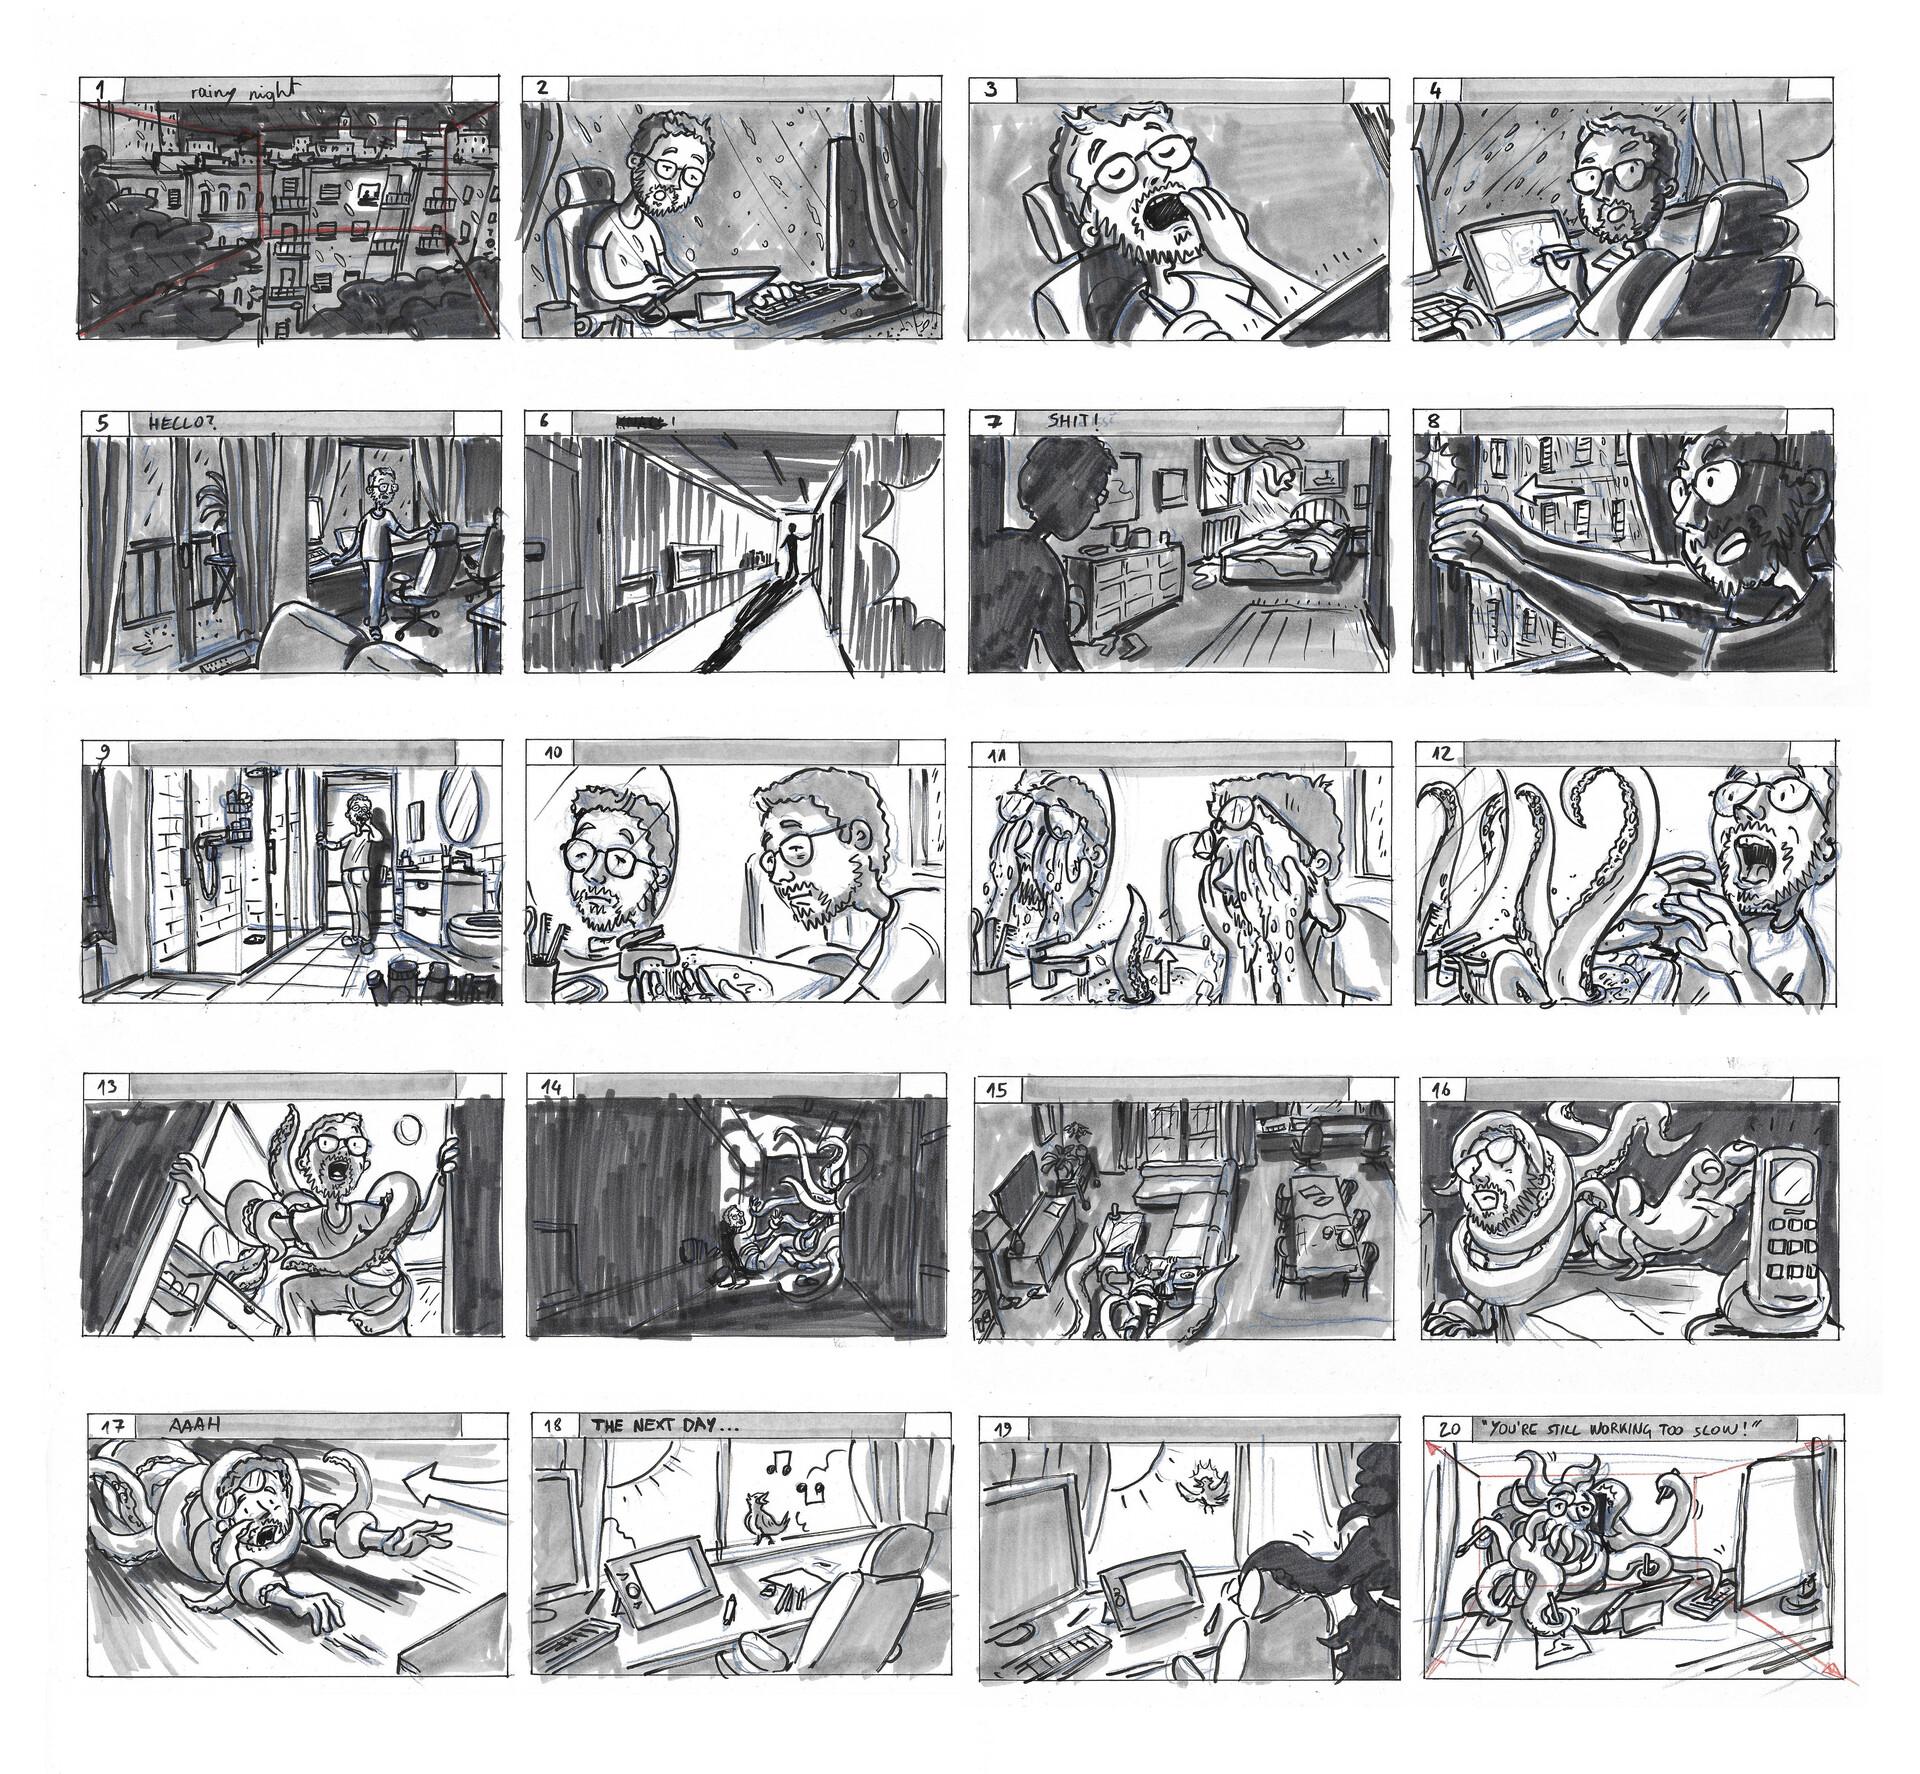 Nicolas rivero storyboard full